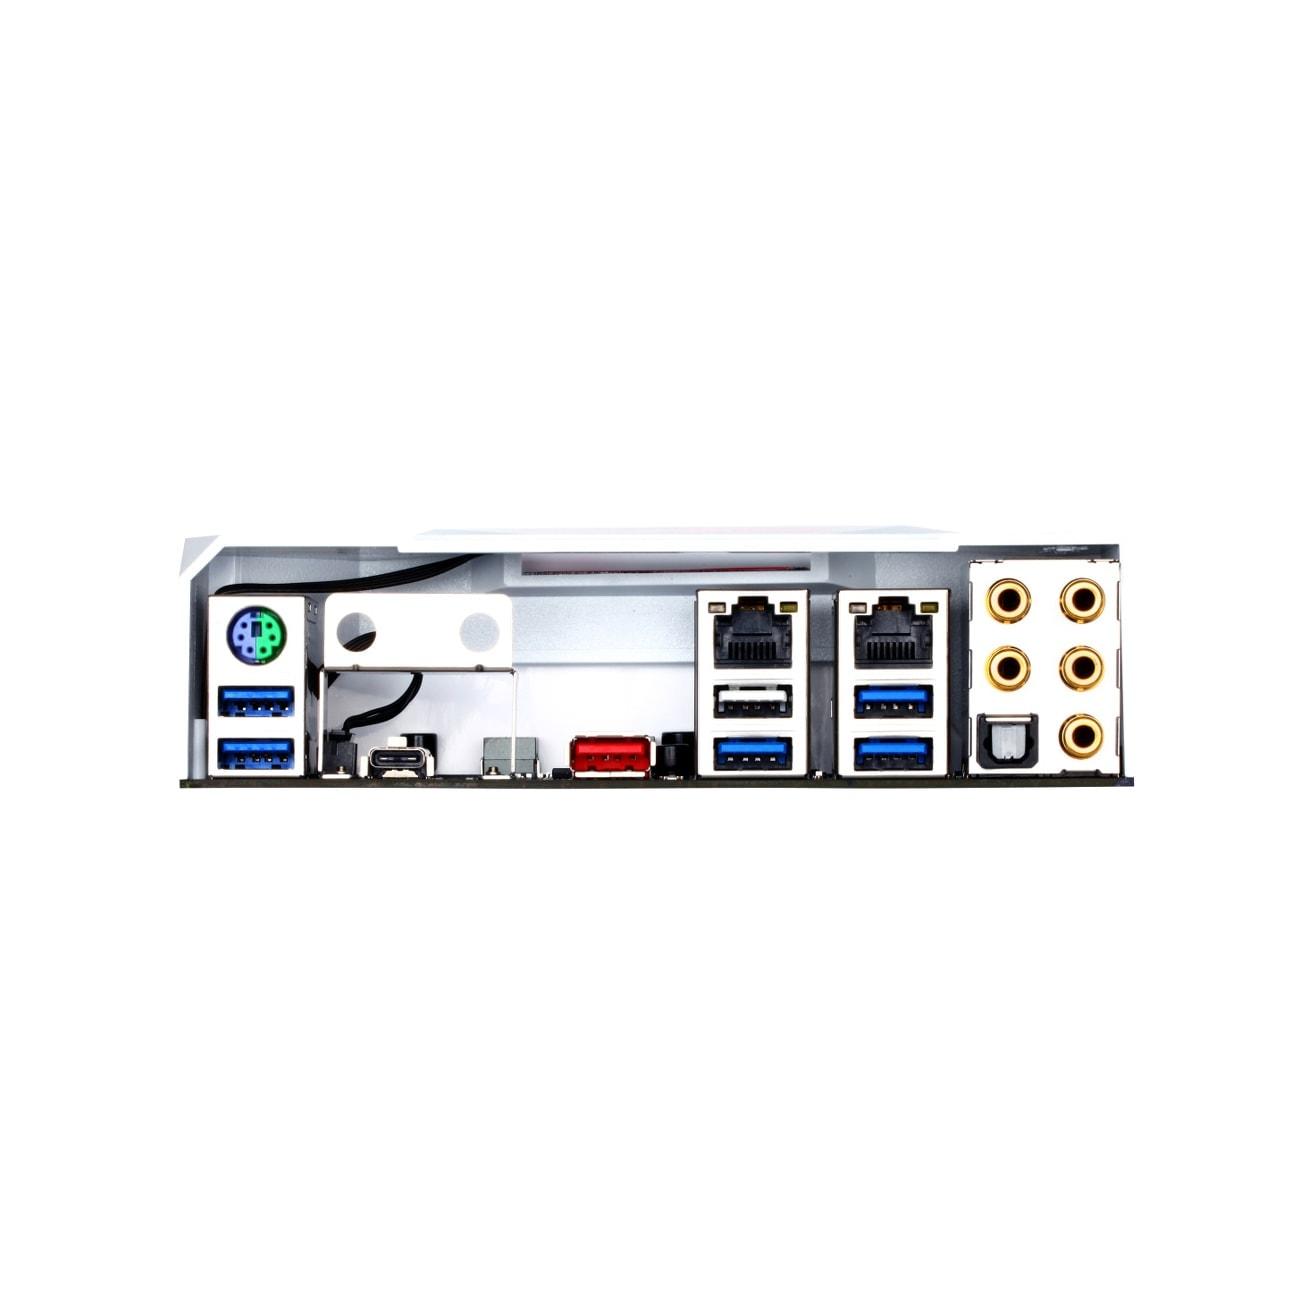 Gigabyte X99-Ultra Gaming -X99/LGA2011-3/DDR4/CF/SLI/ATX ATX DDR4 - Carte mère - 2